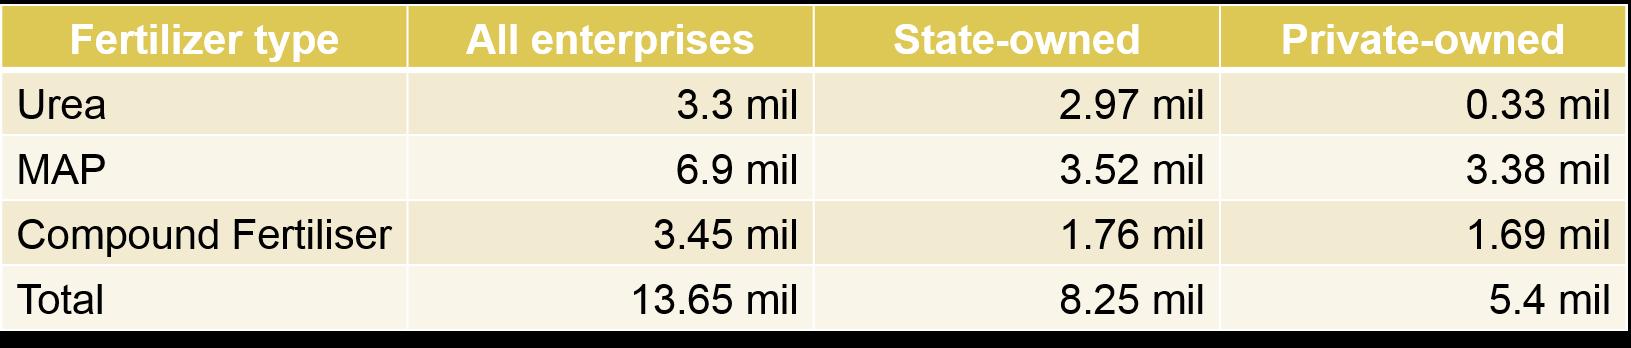 China has announced import tariff quotas on fertilisers 2018